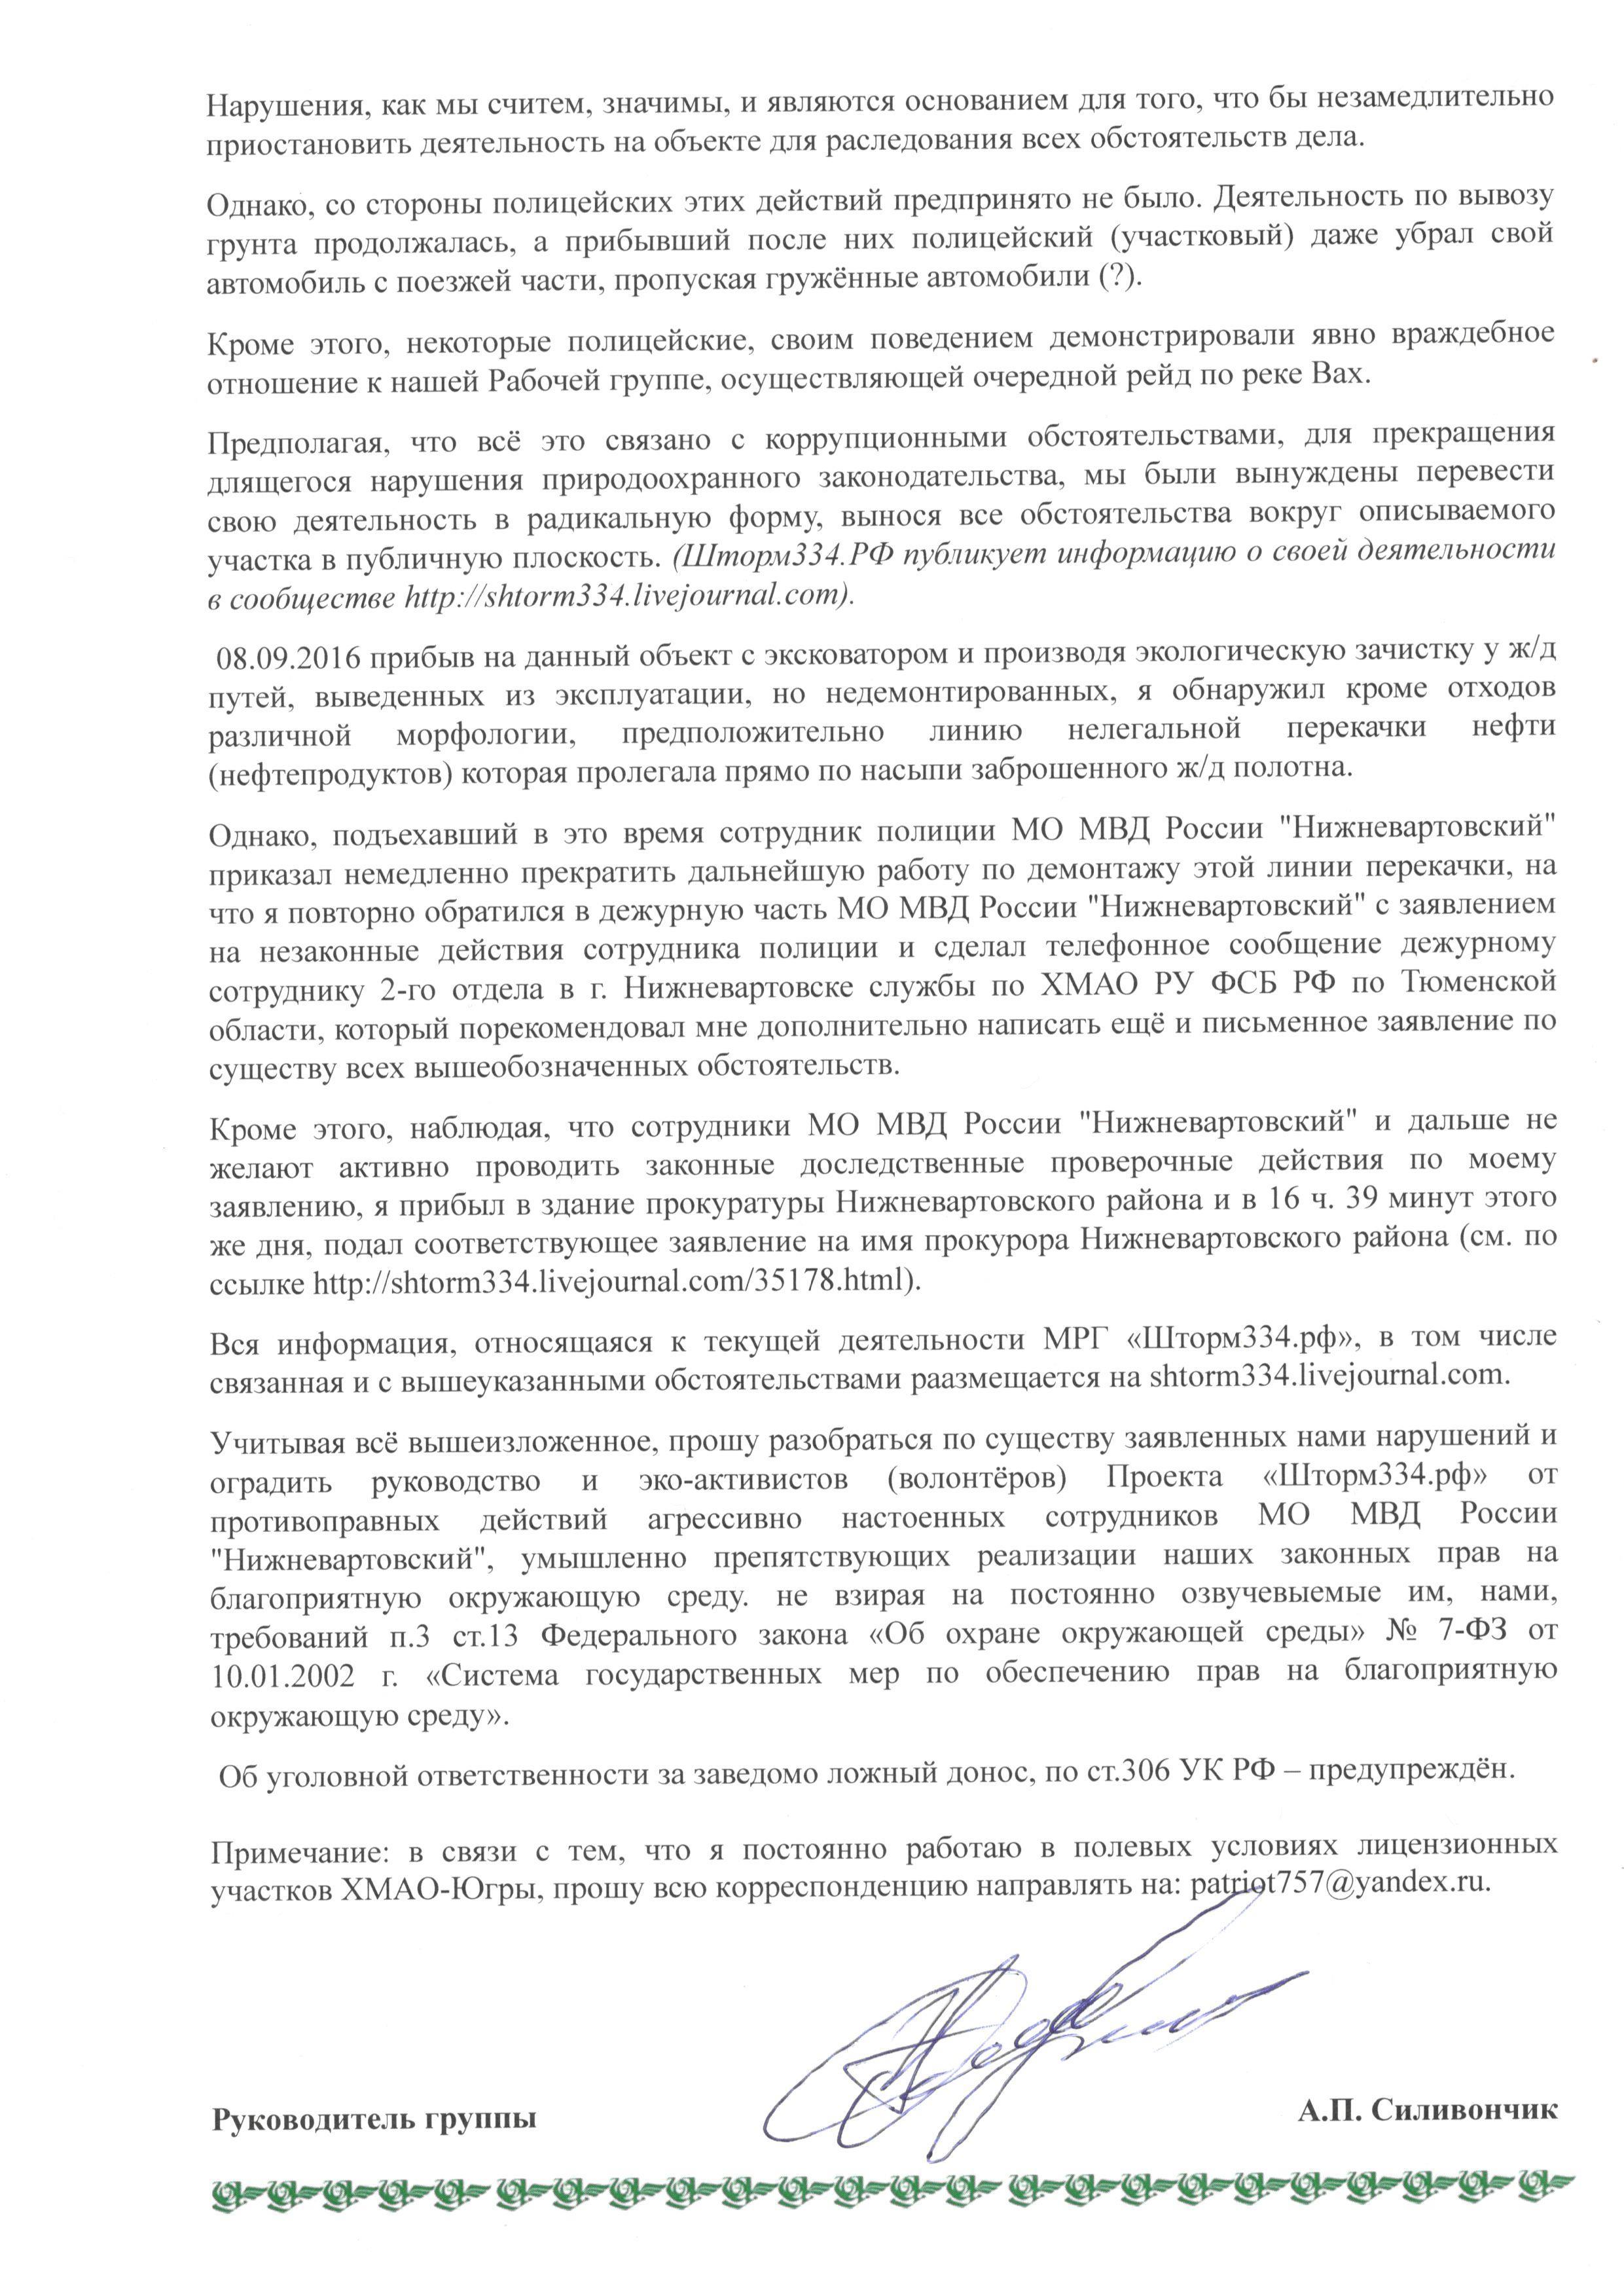 ФСБ-20002